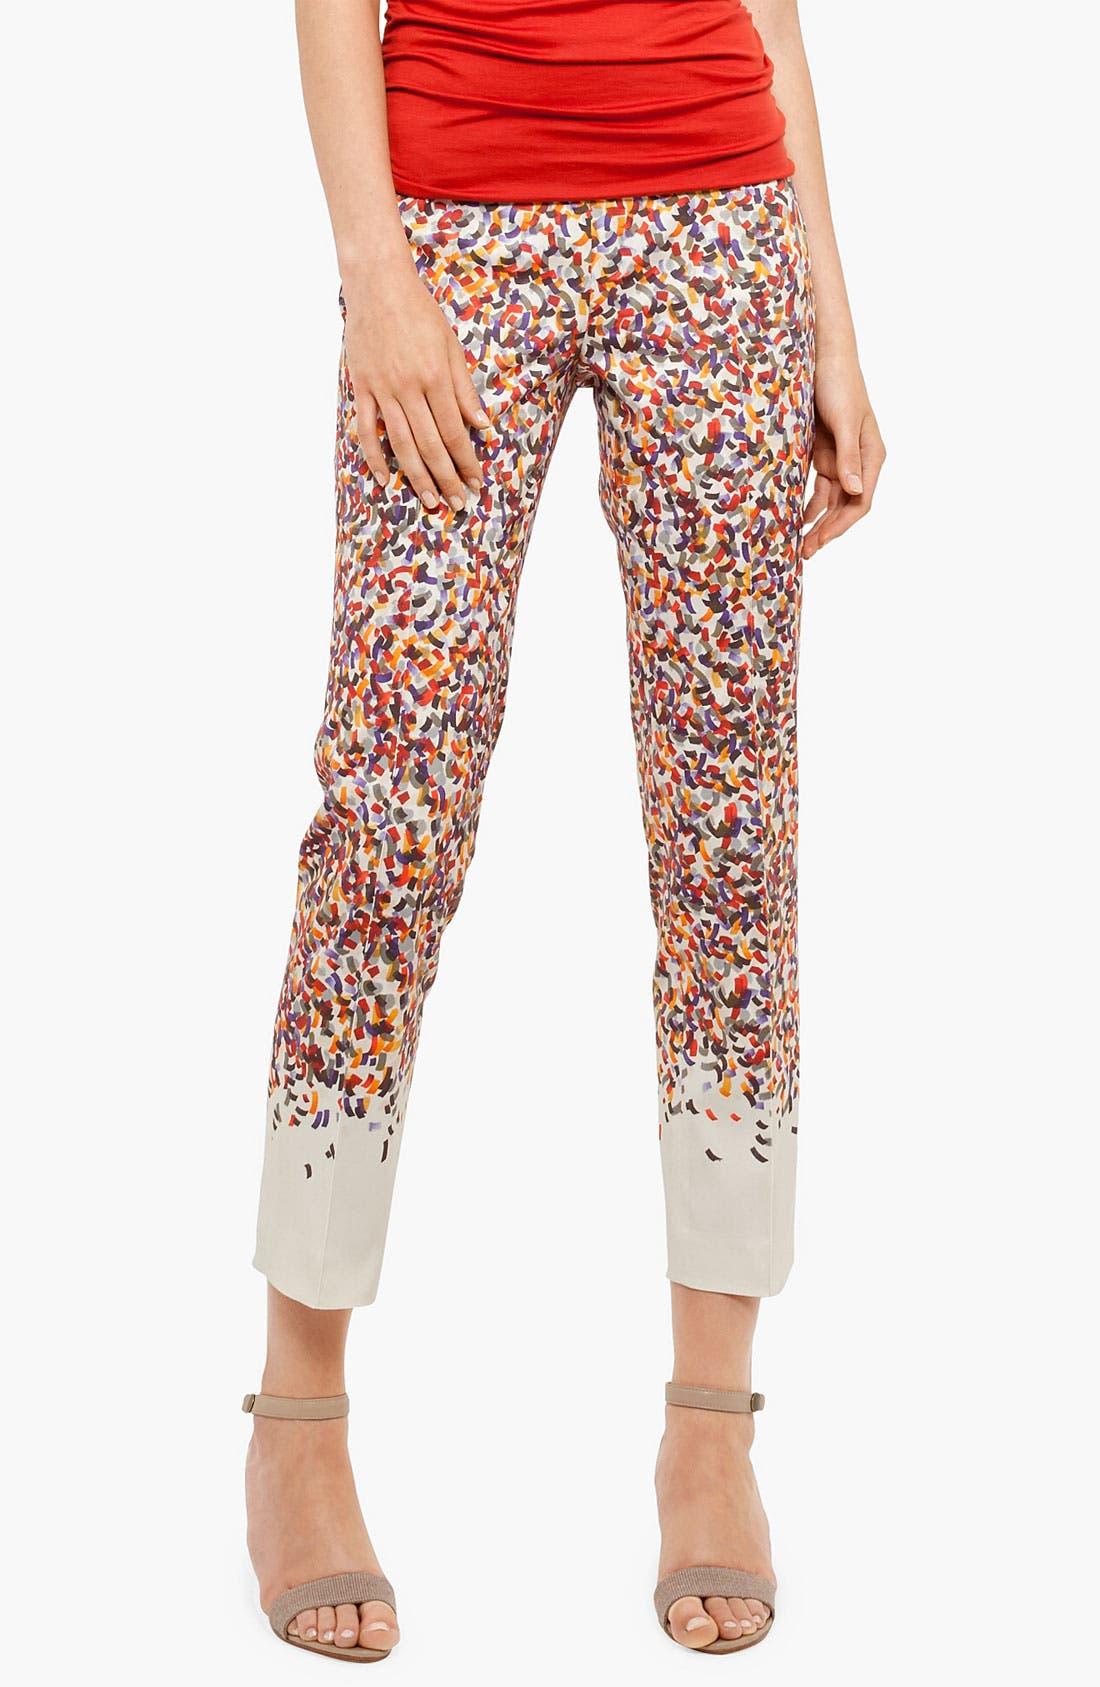 Alternate Image 1 Selected - Akris punto 'Franca' Confetti Print Crop Pants